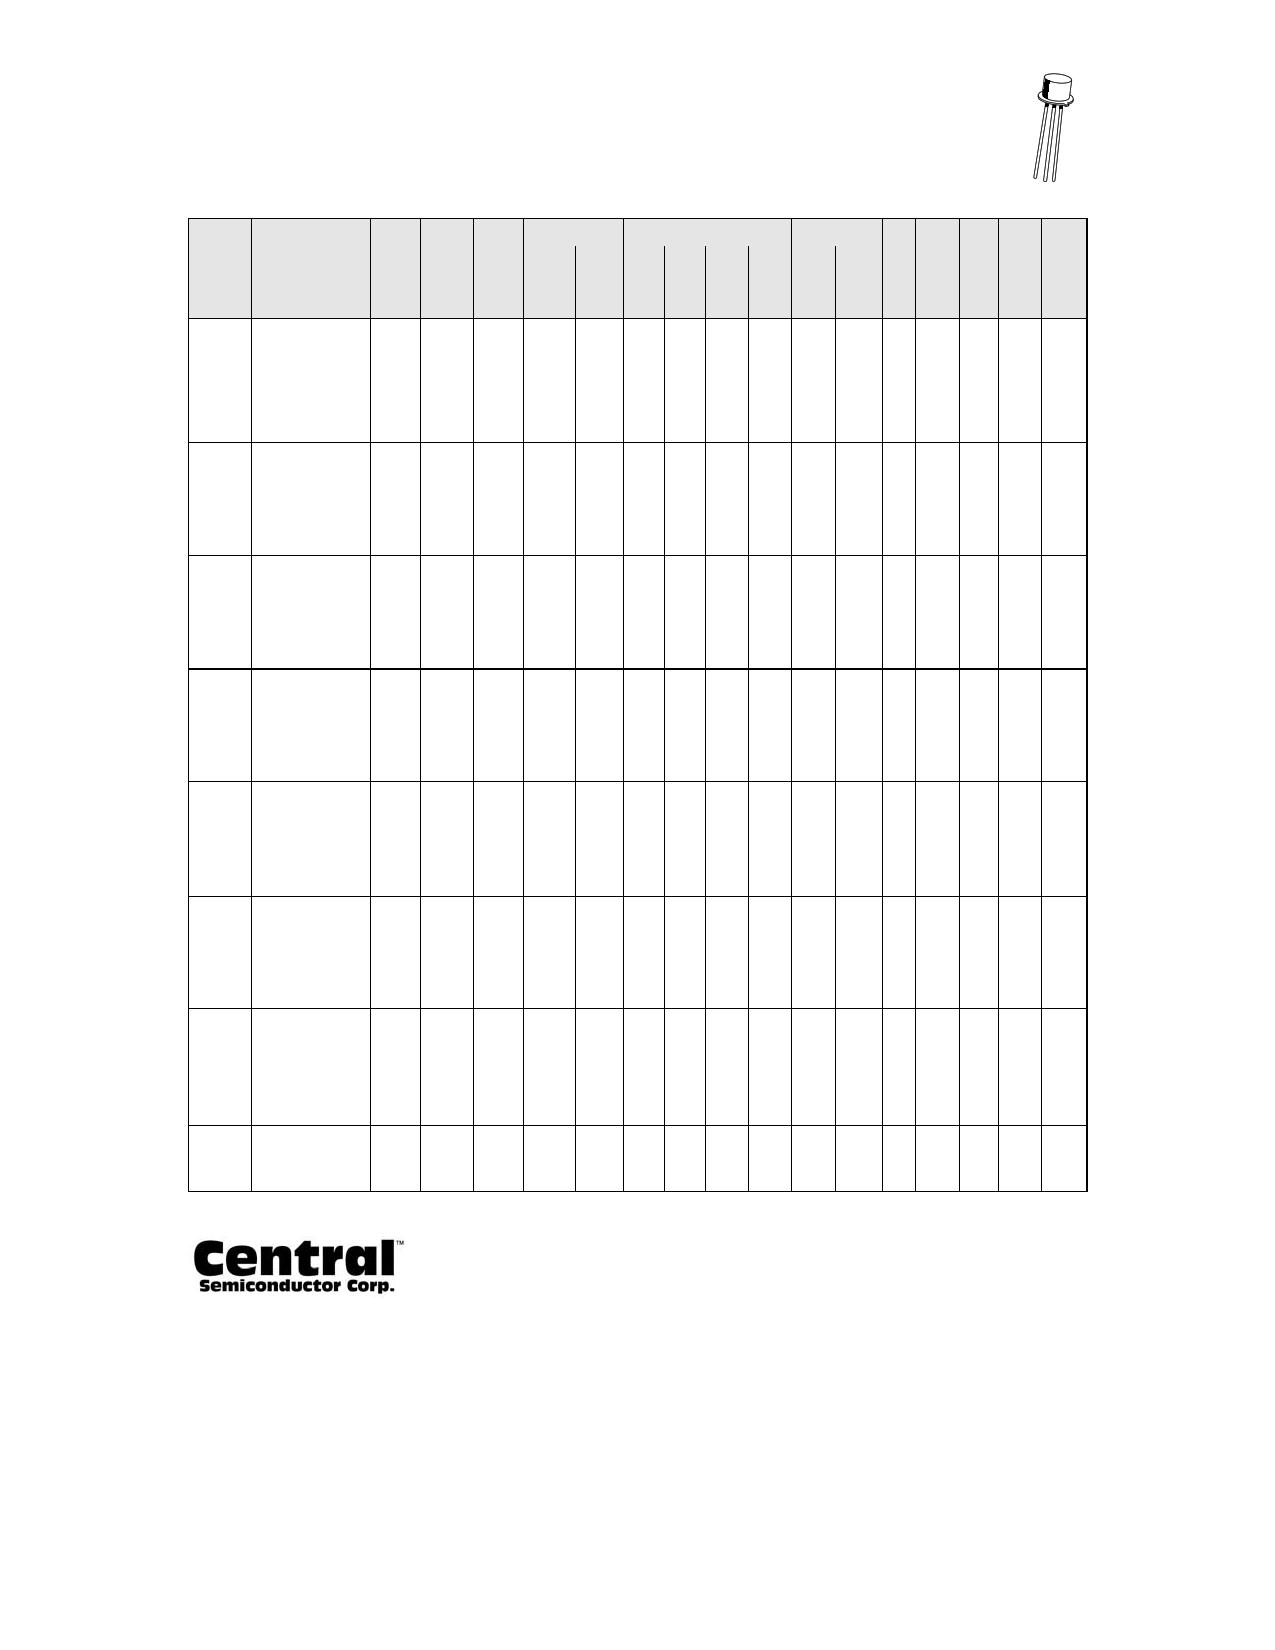 2N3548 datasheet